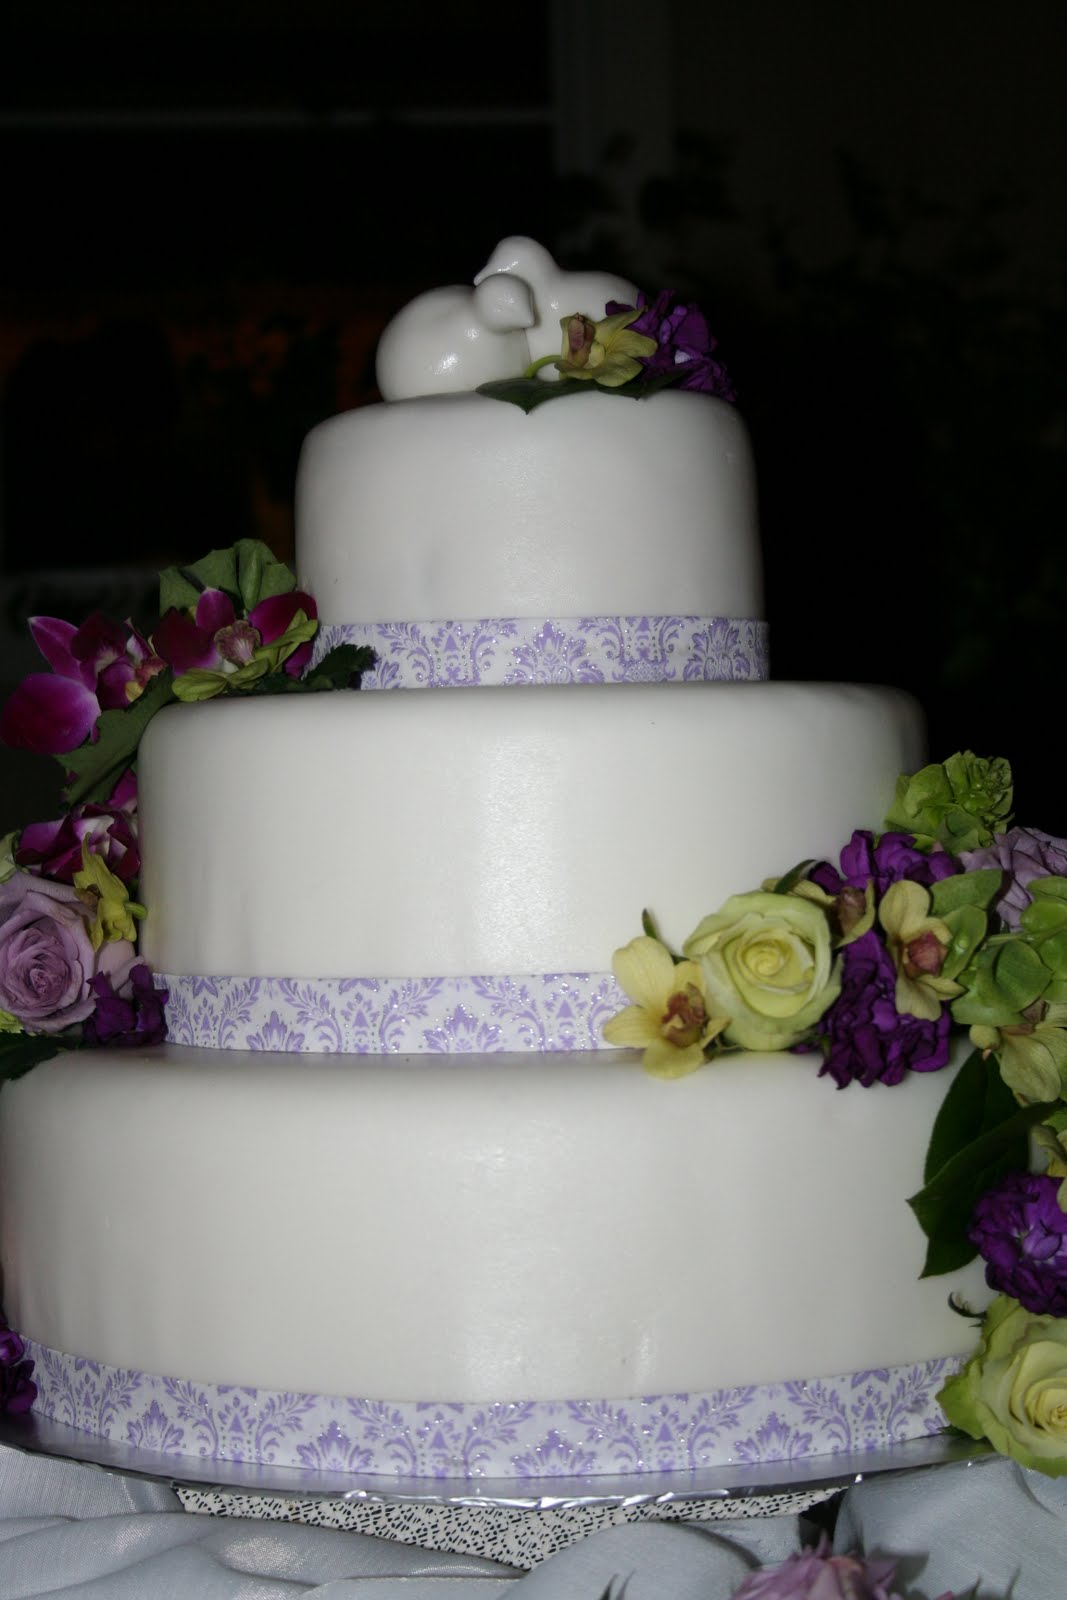 blue moon cakes fondant wedding cake. Black Bedroom Furniture Sets. Home Design Ideas